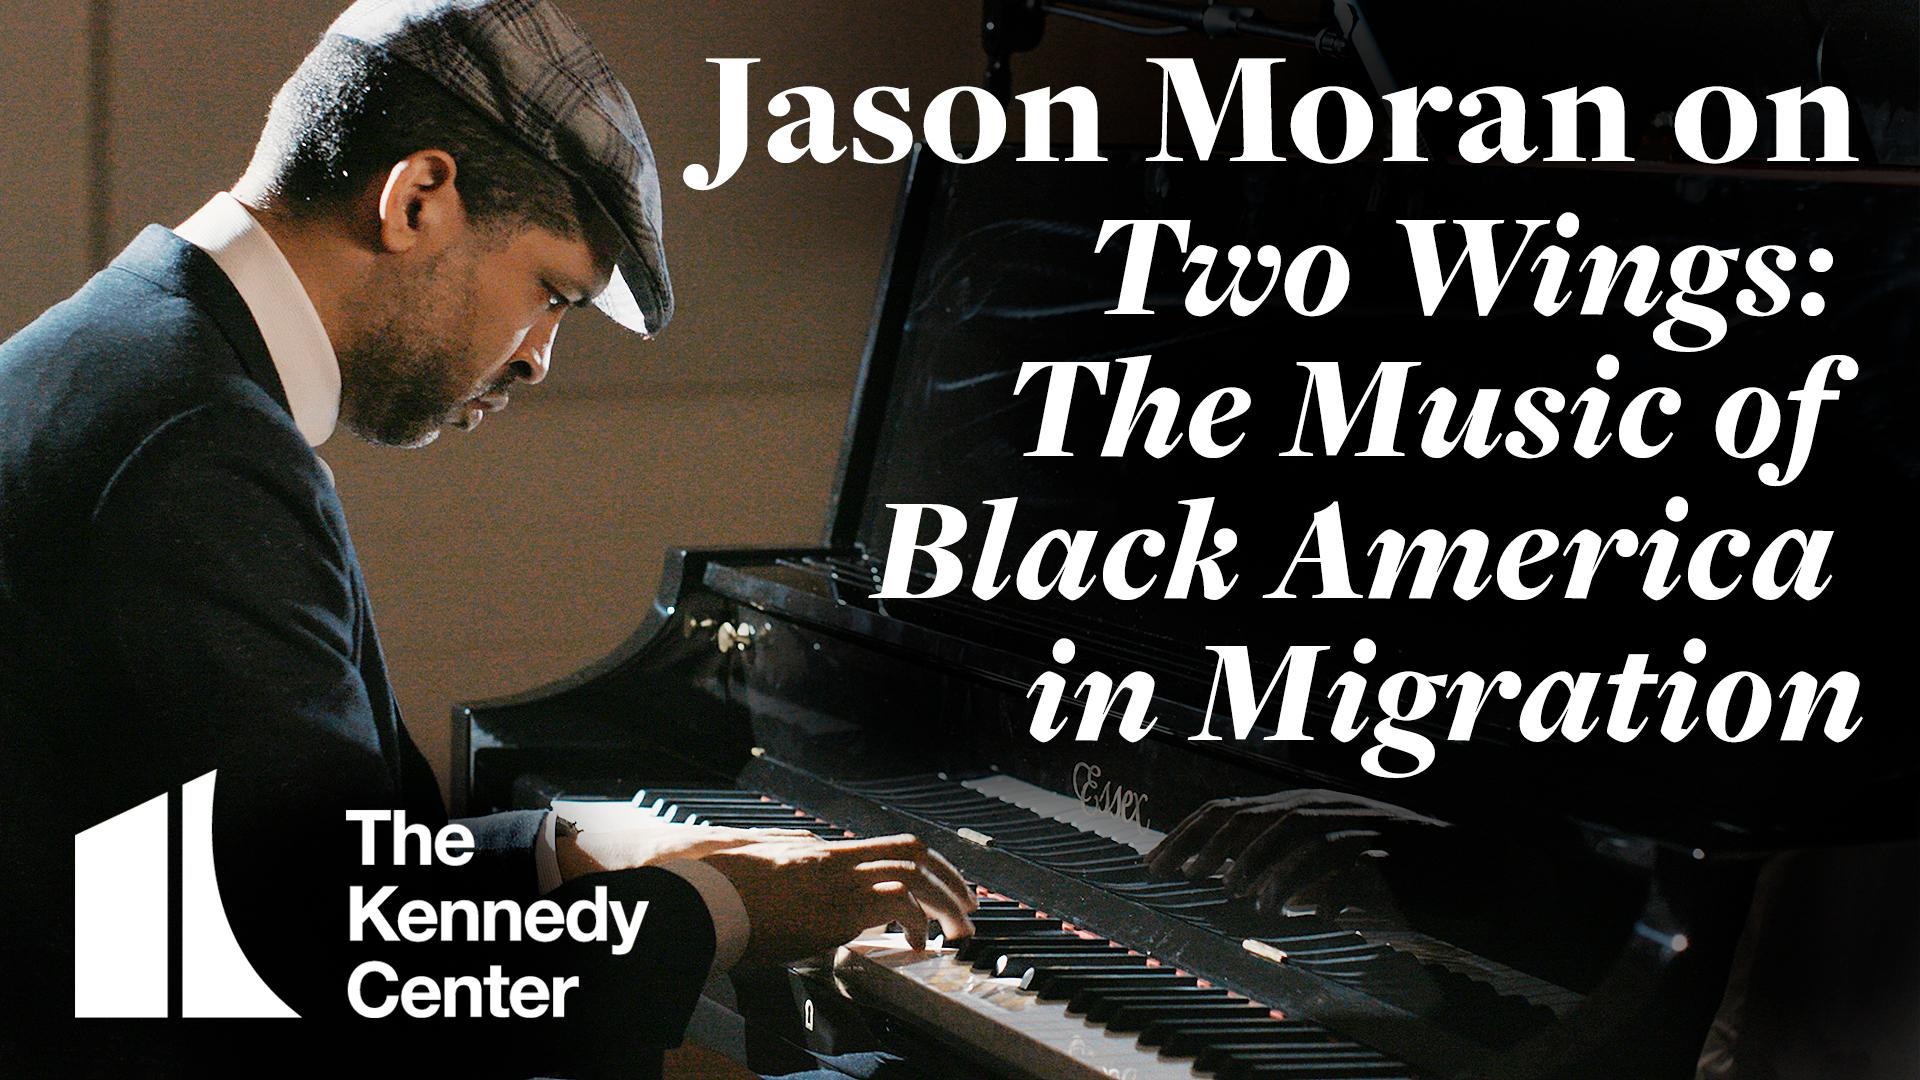 Jason Moran on